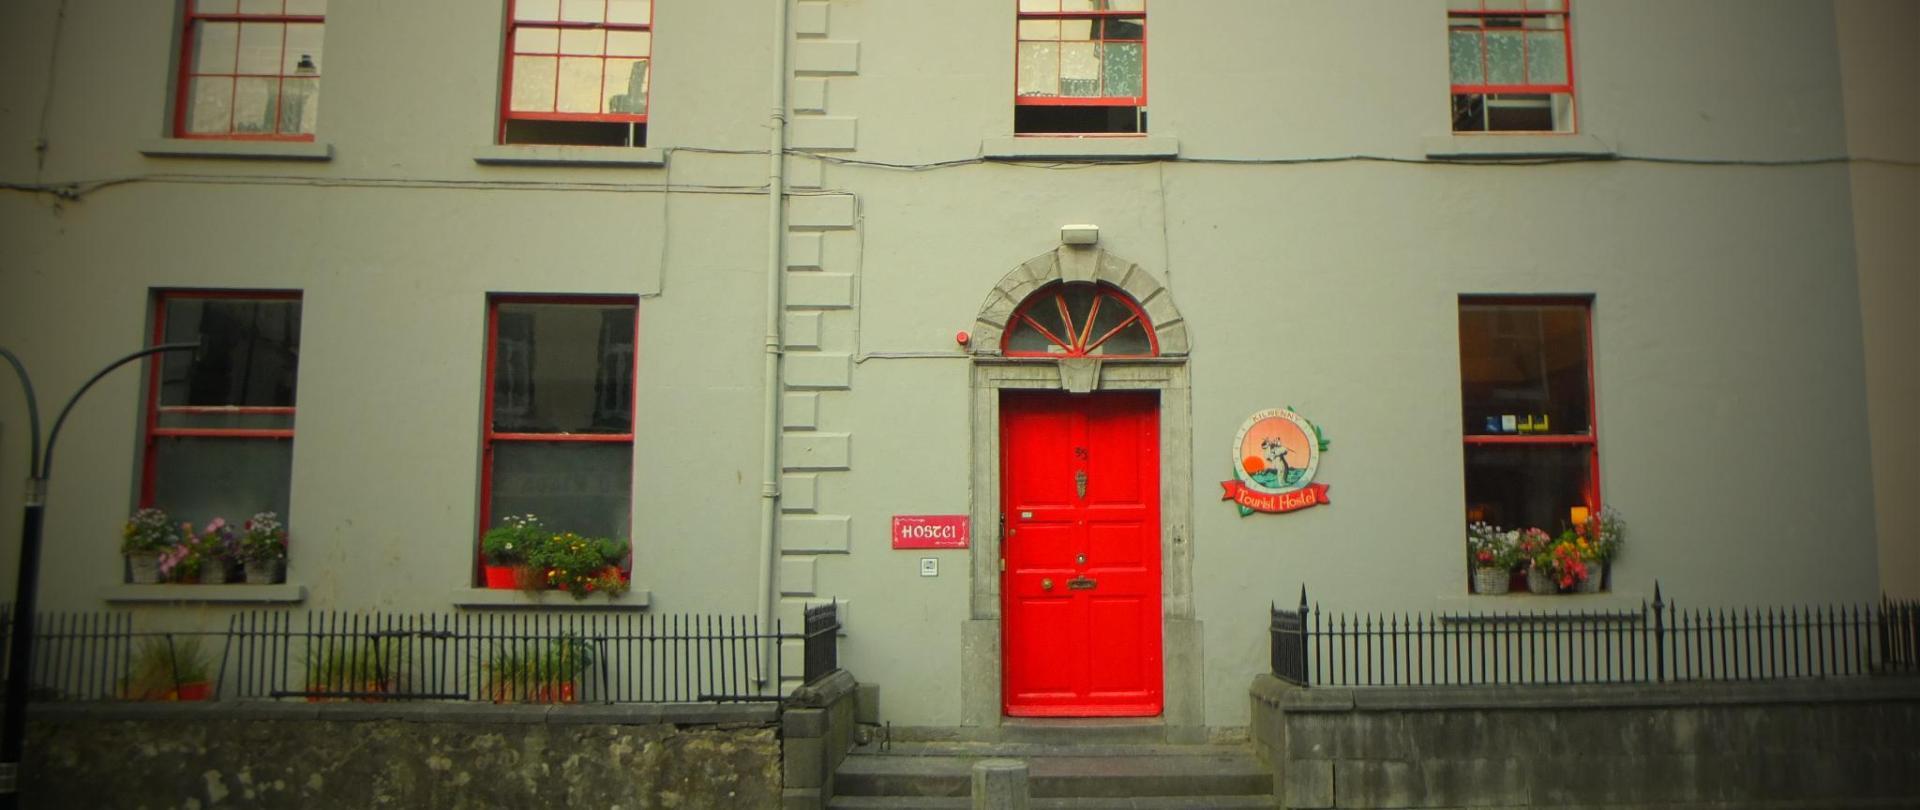 Kilkenny Tourist Hostel at 35 Parliament street Kilkenny